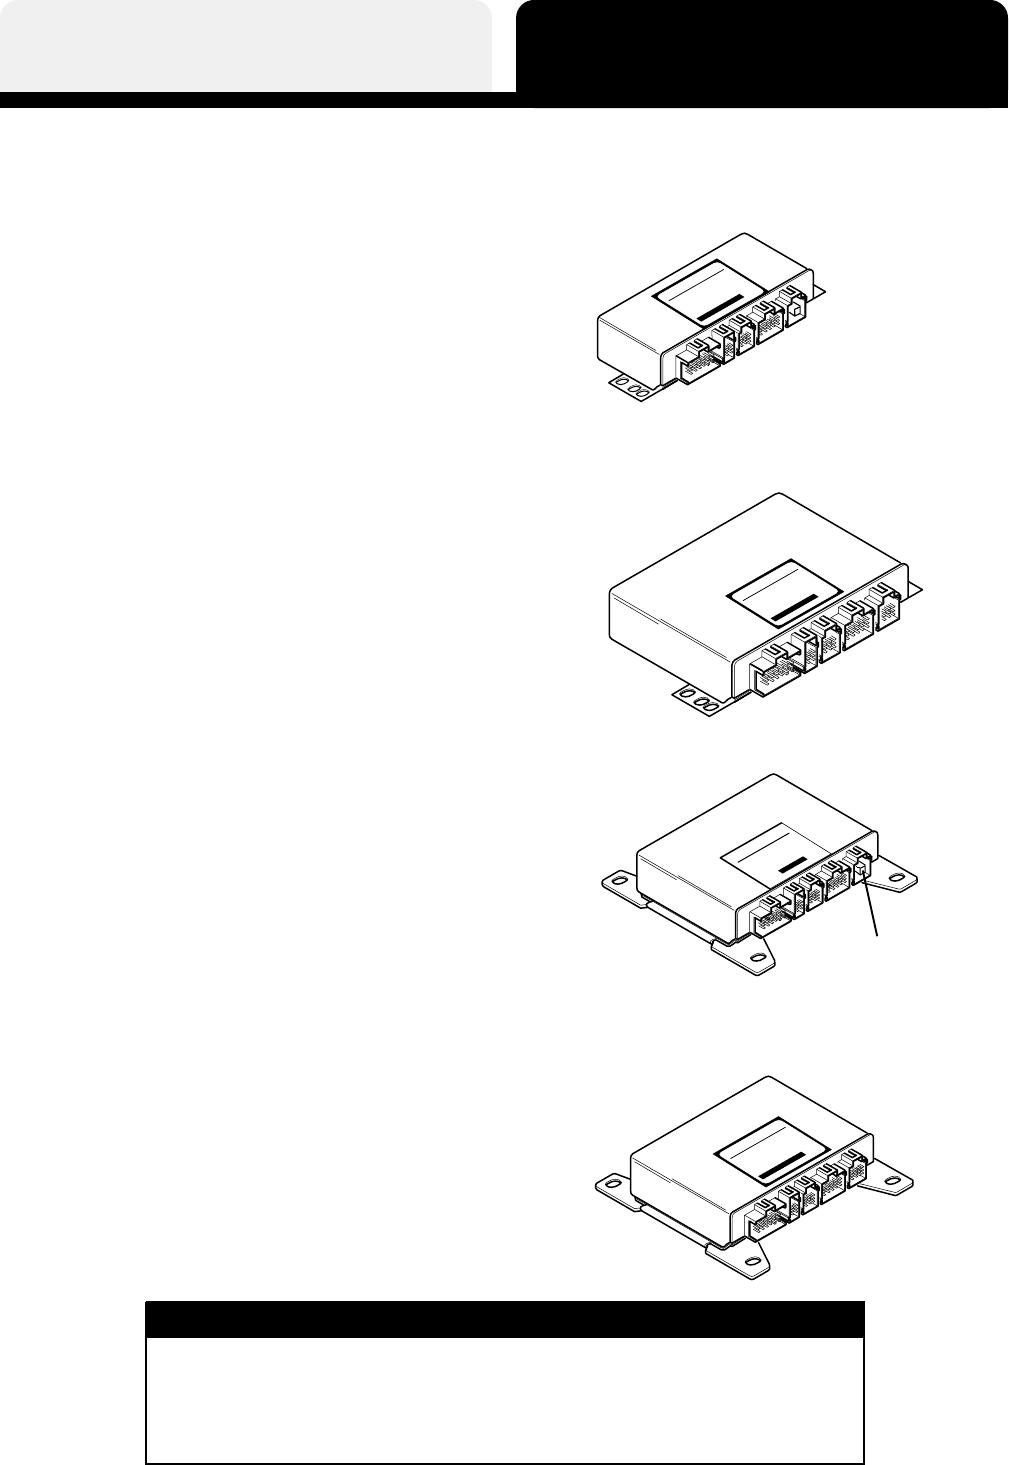 Bendix 13 Pwr 1 Users Manual